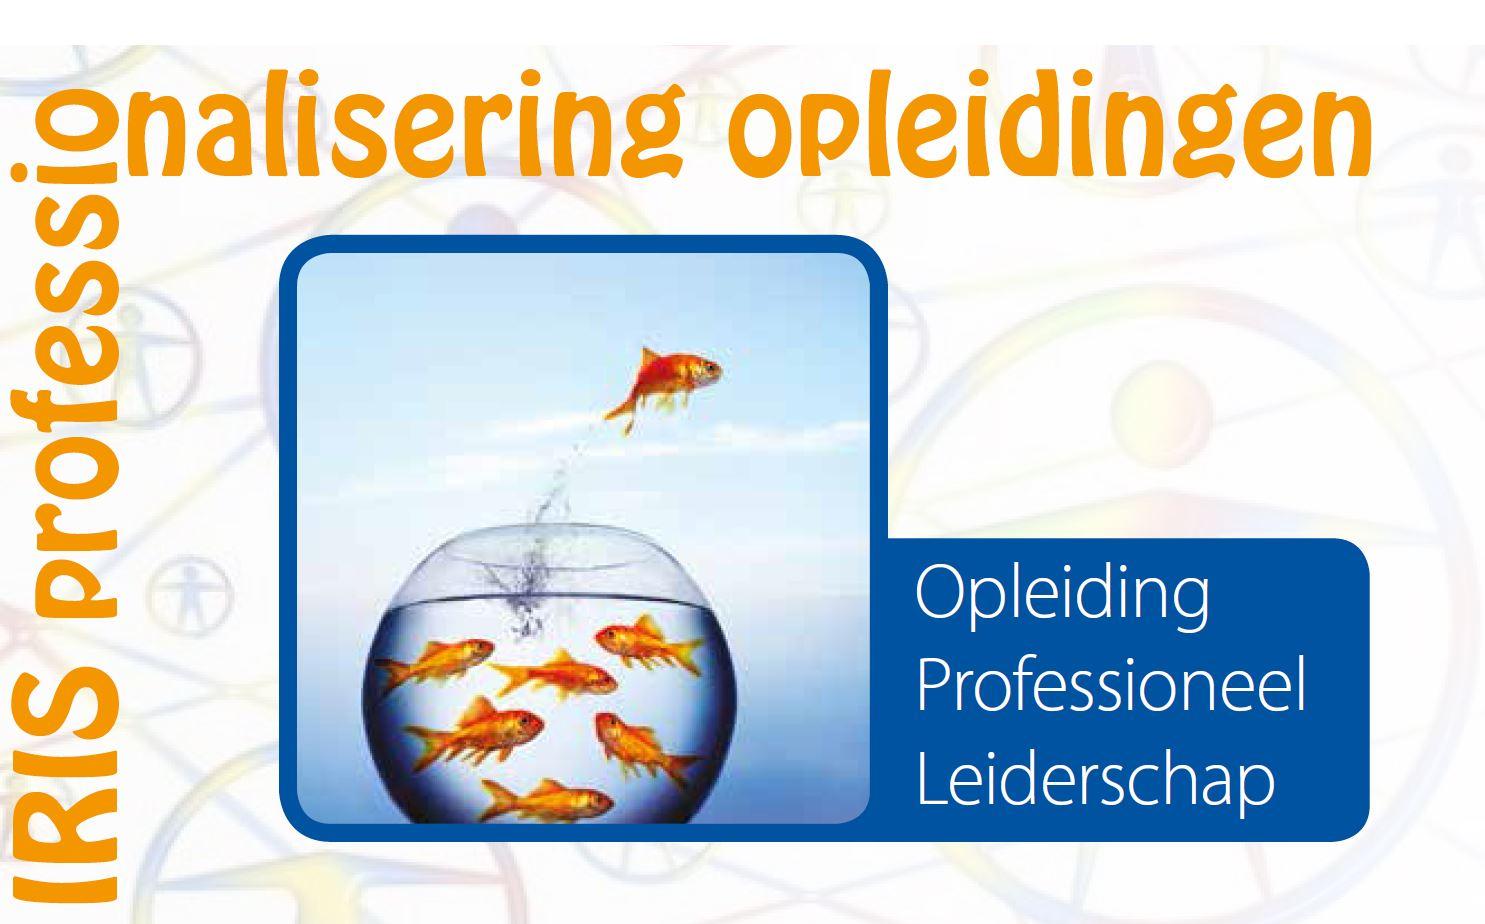 Stichting-IRIS-opleiding-Opleiding-professioneel-leiderschap